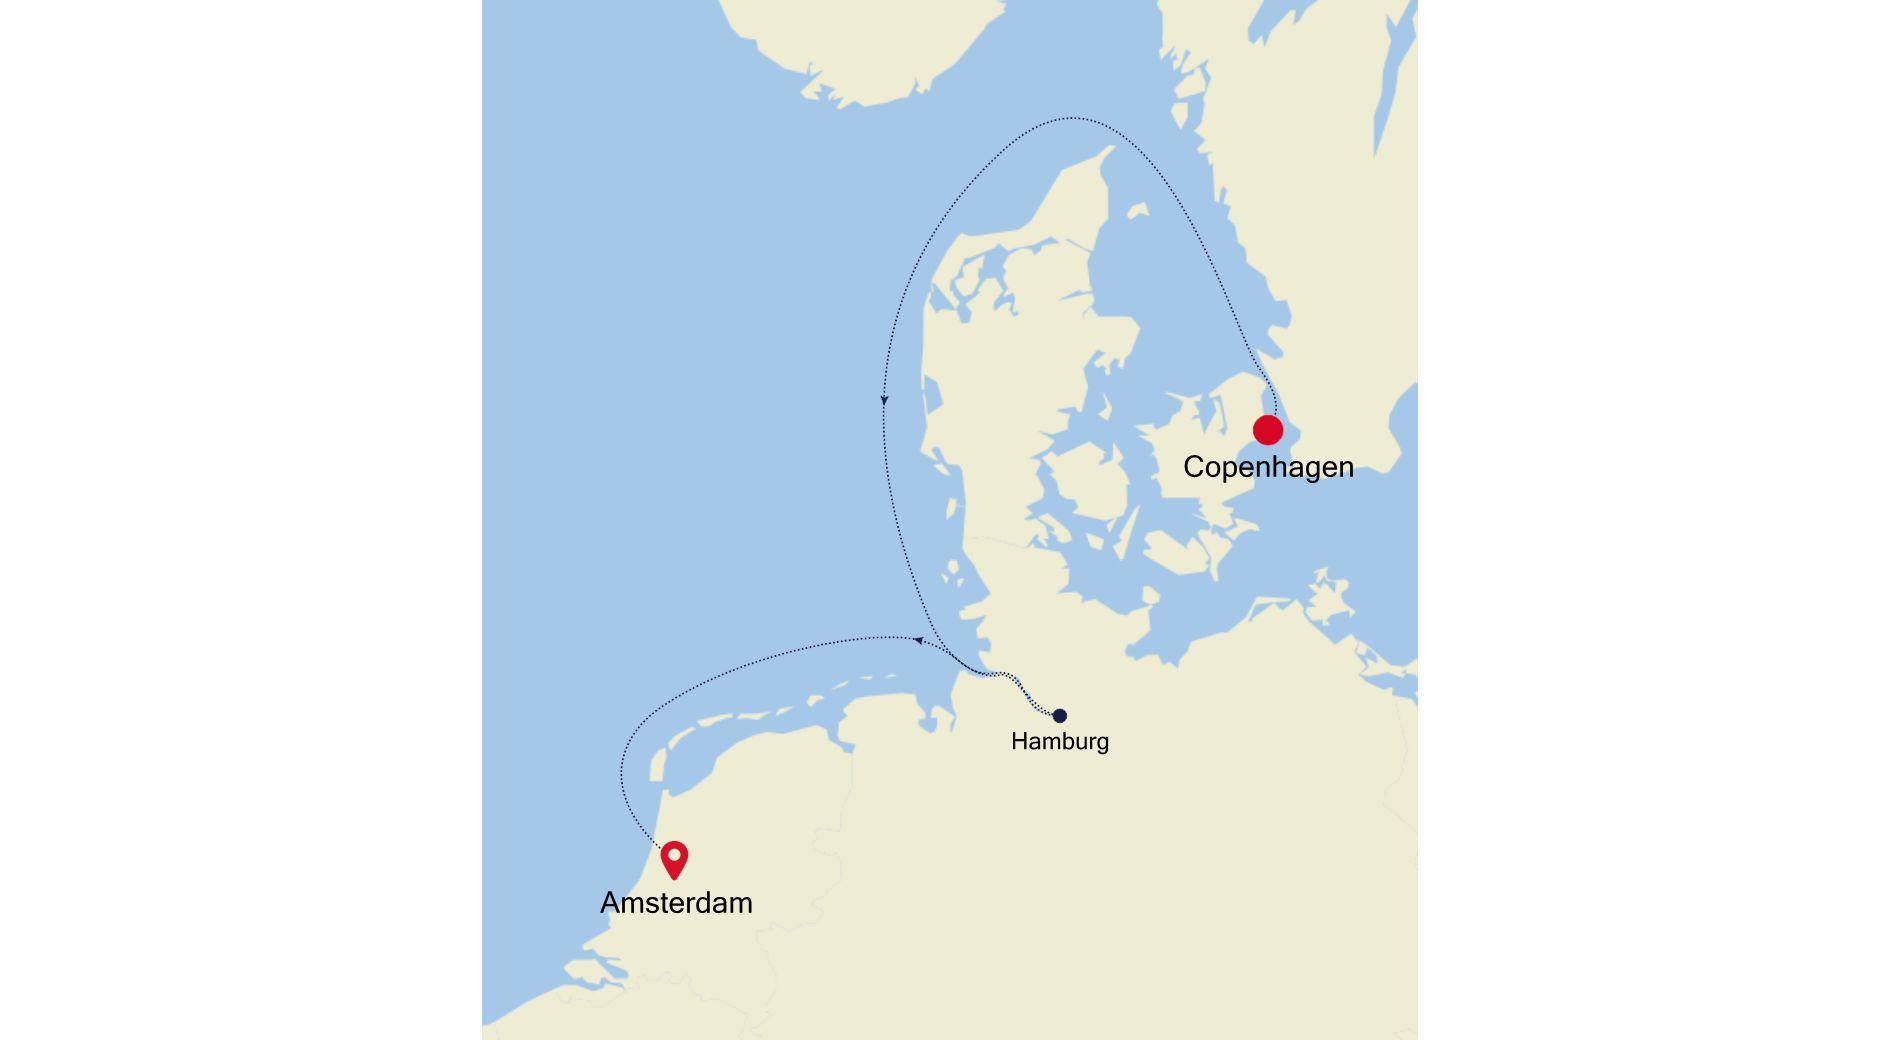 SL200903005 - Copenhagen to Amsterdam